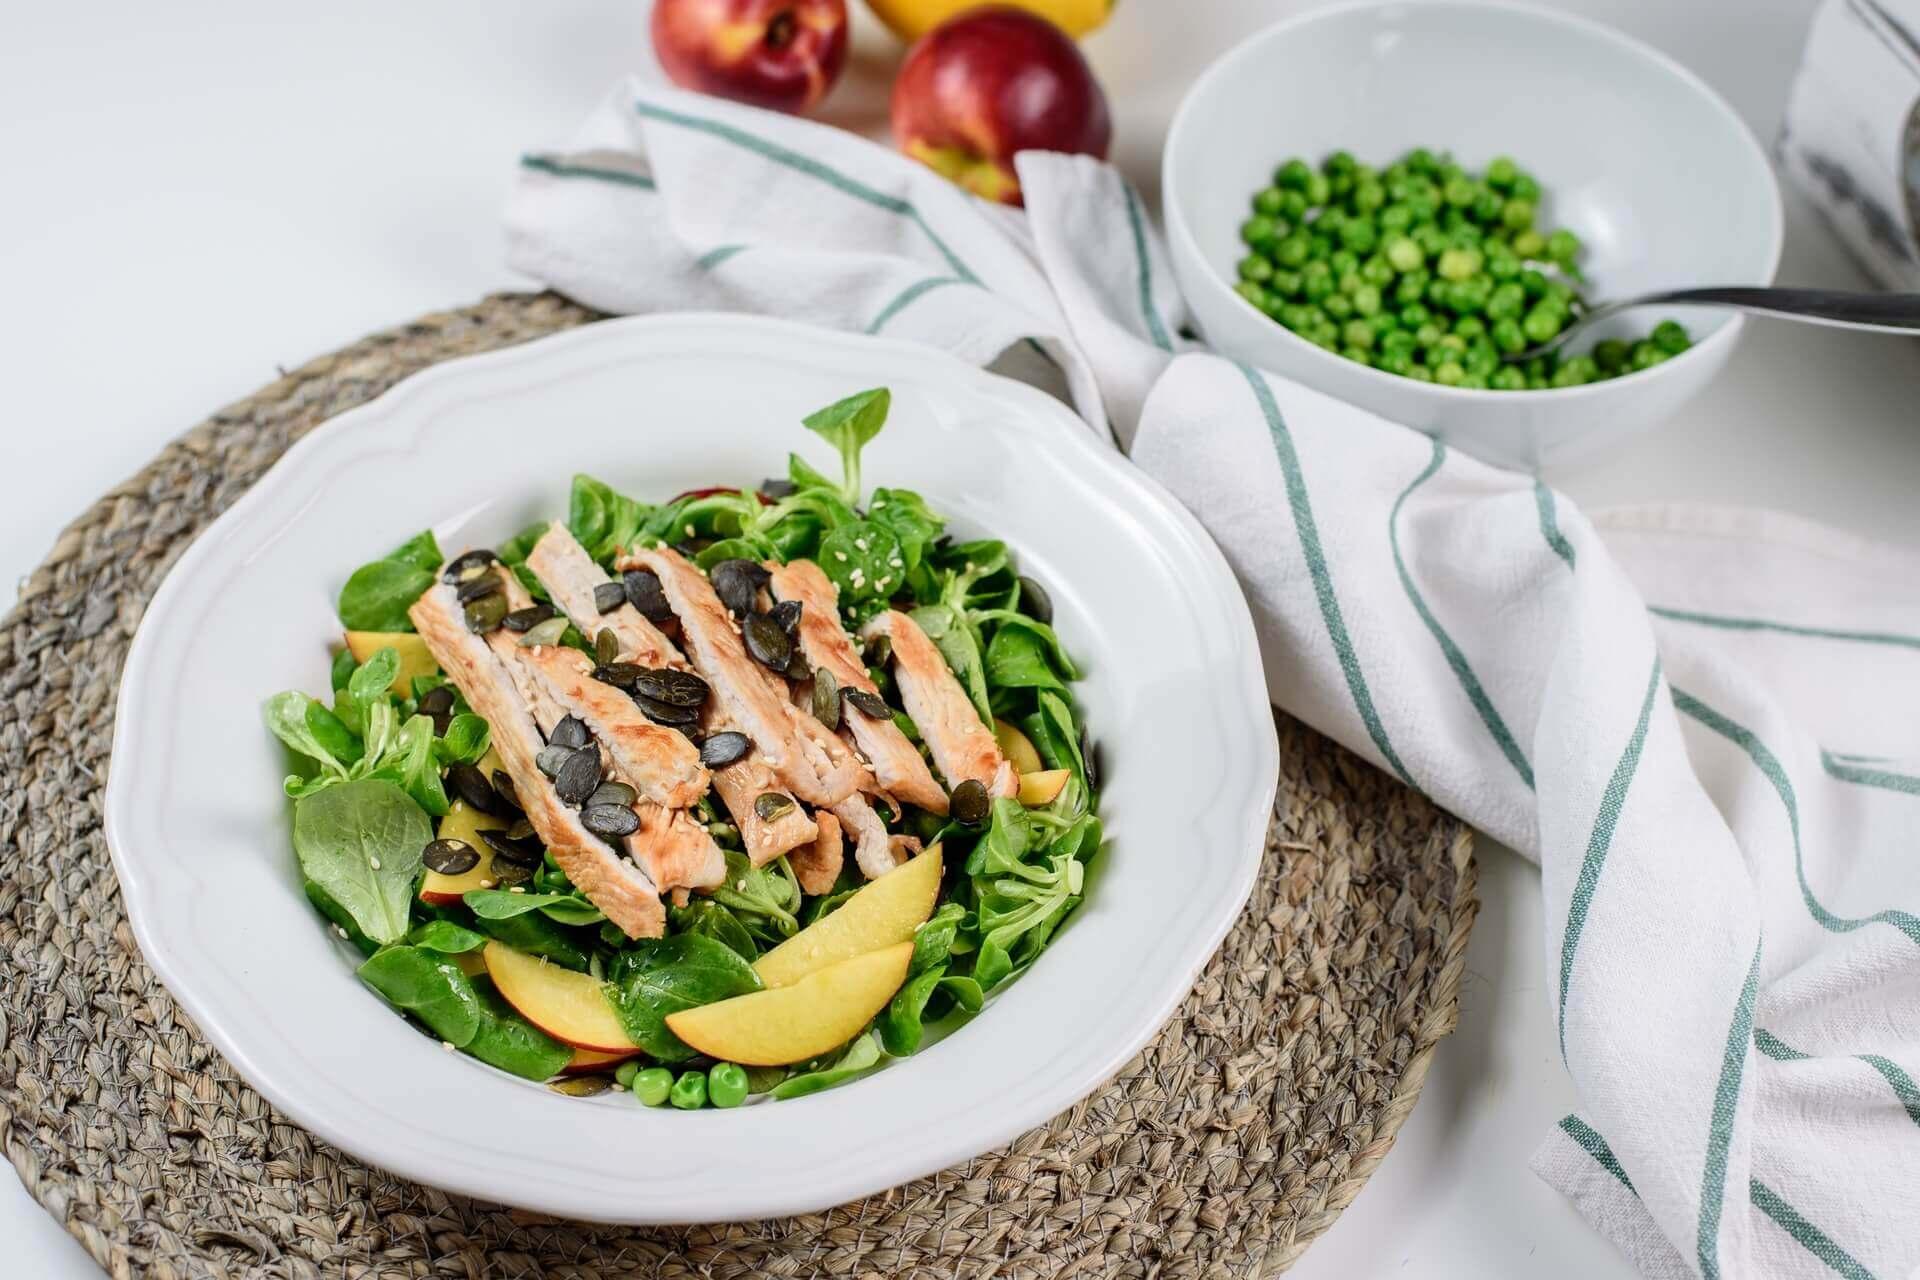 letnja salata, klub zdravih navika, kzn, letnja salata klub zdravih navika, letnja salata kzn, salata sa nektarinom, salata sa curetinom, cureca salata, rucak, slano, zdrav obrok, Iceberg Salat Centar